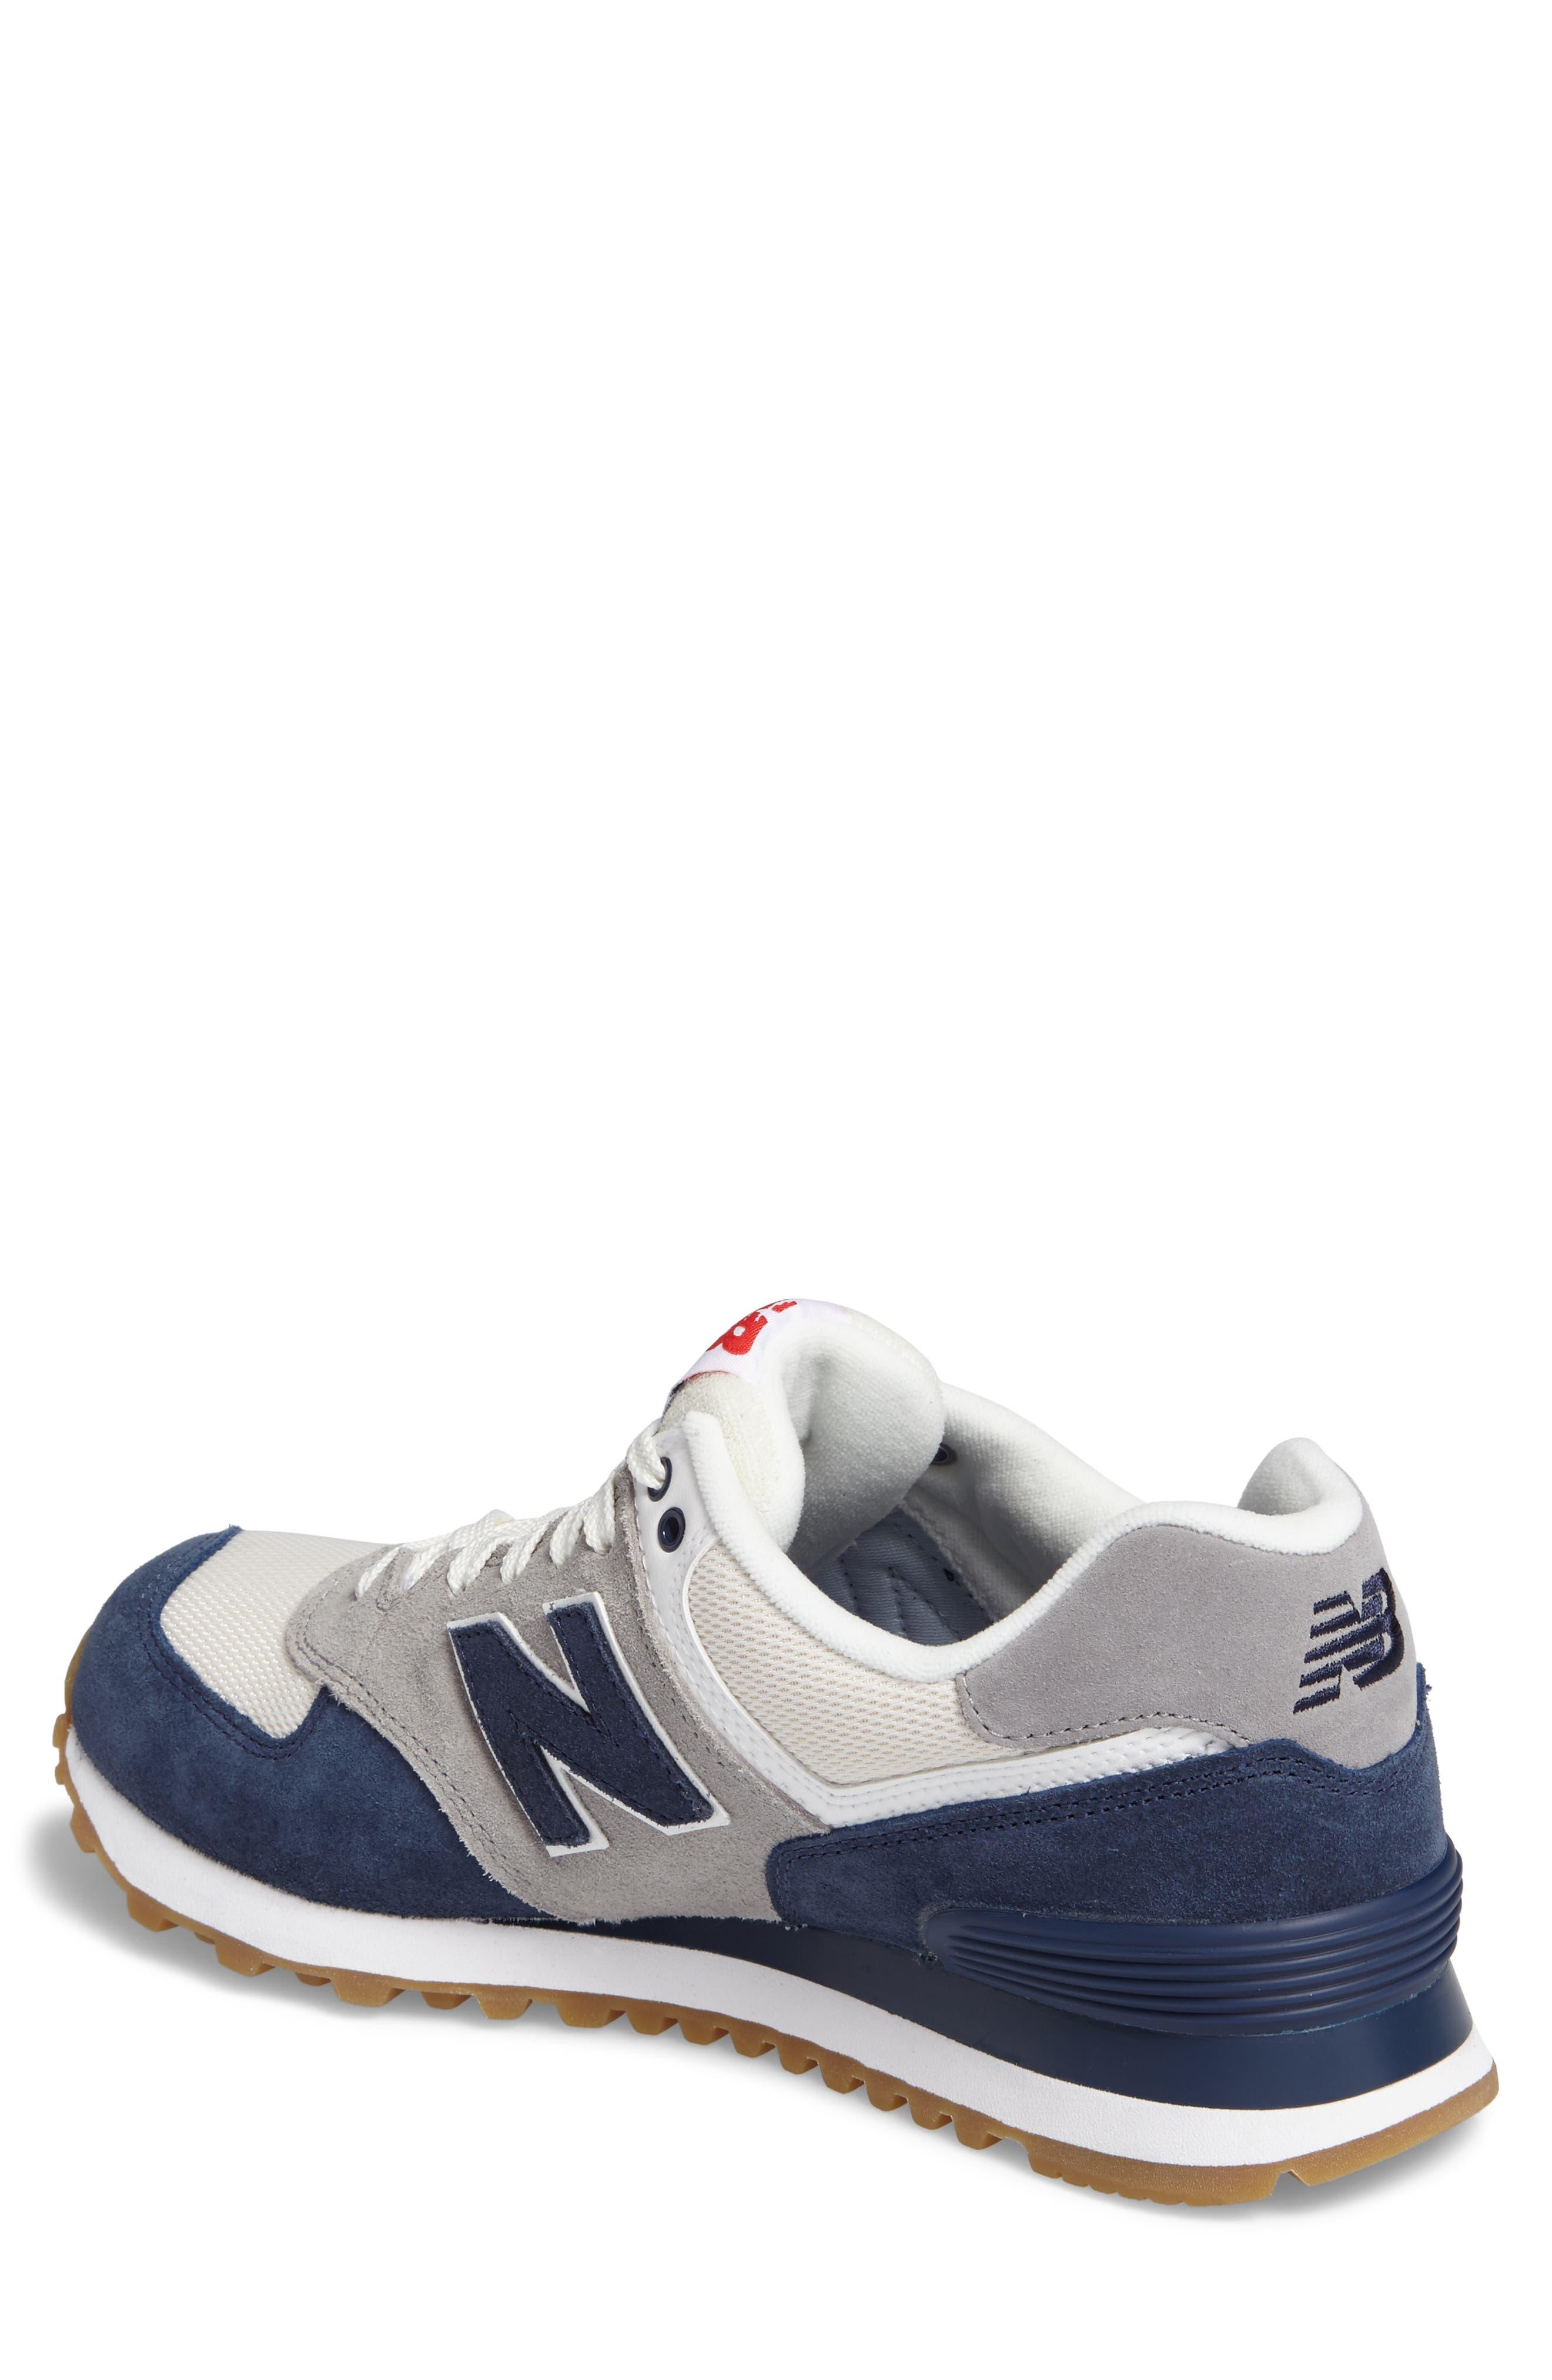 574 Retro Sport Sneaker,                             Alternate thumbnail 2, color,                             Electric Blue